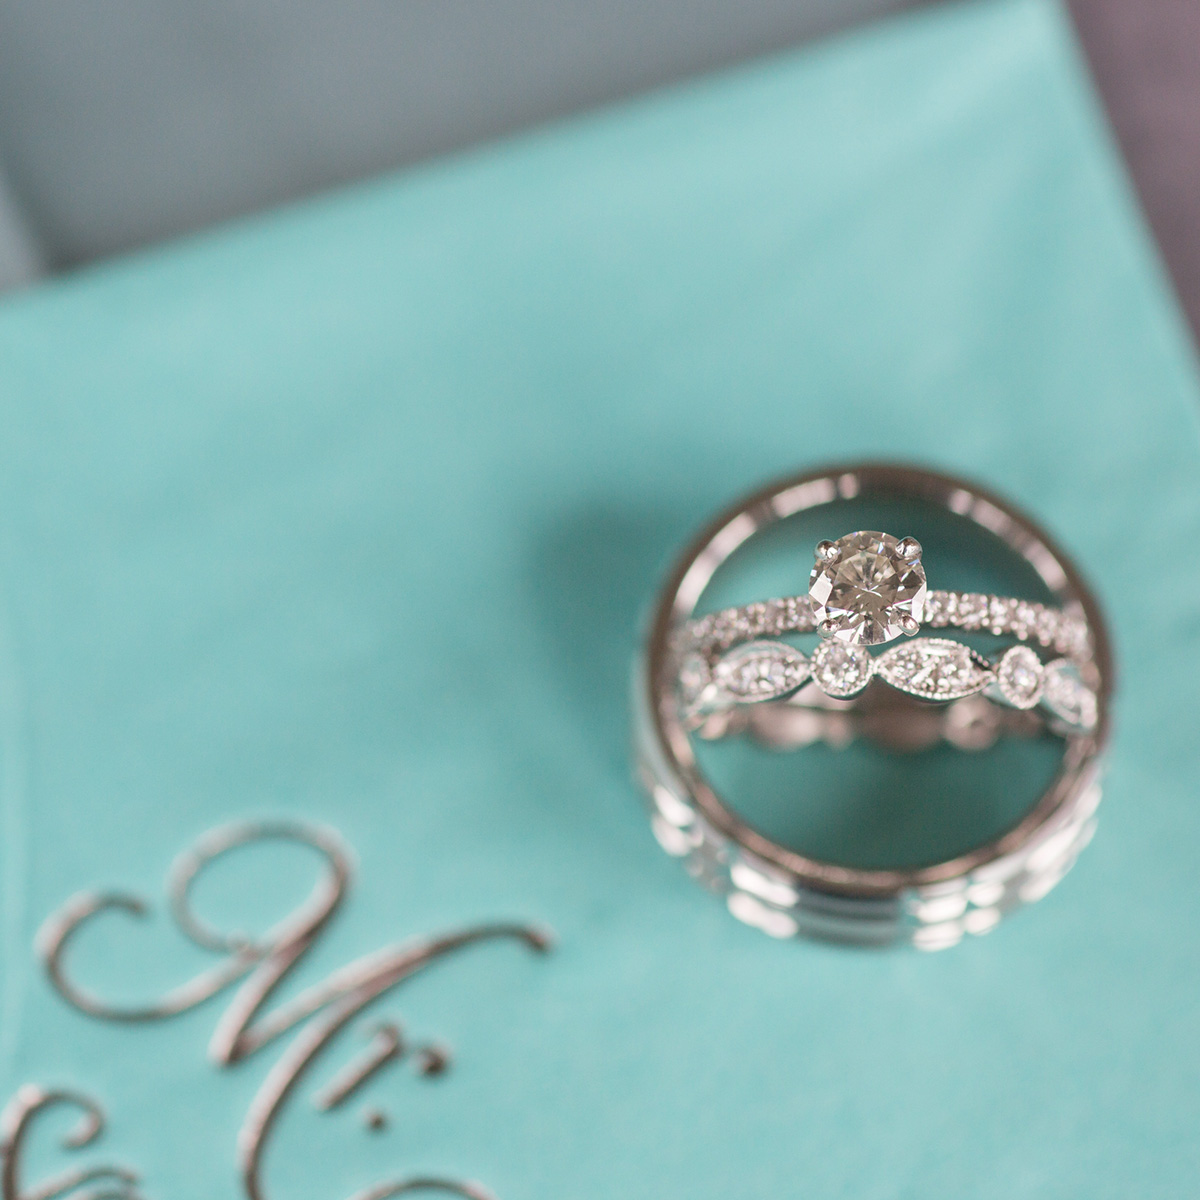 EverElla_Wedding_Travel_Rings.jpg